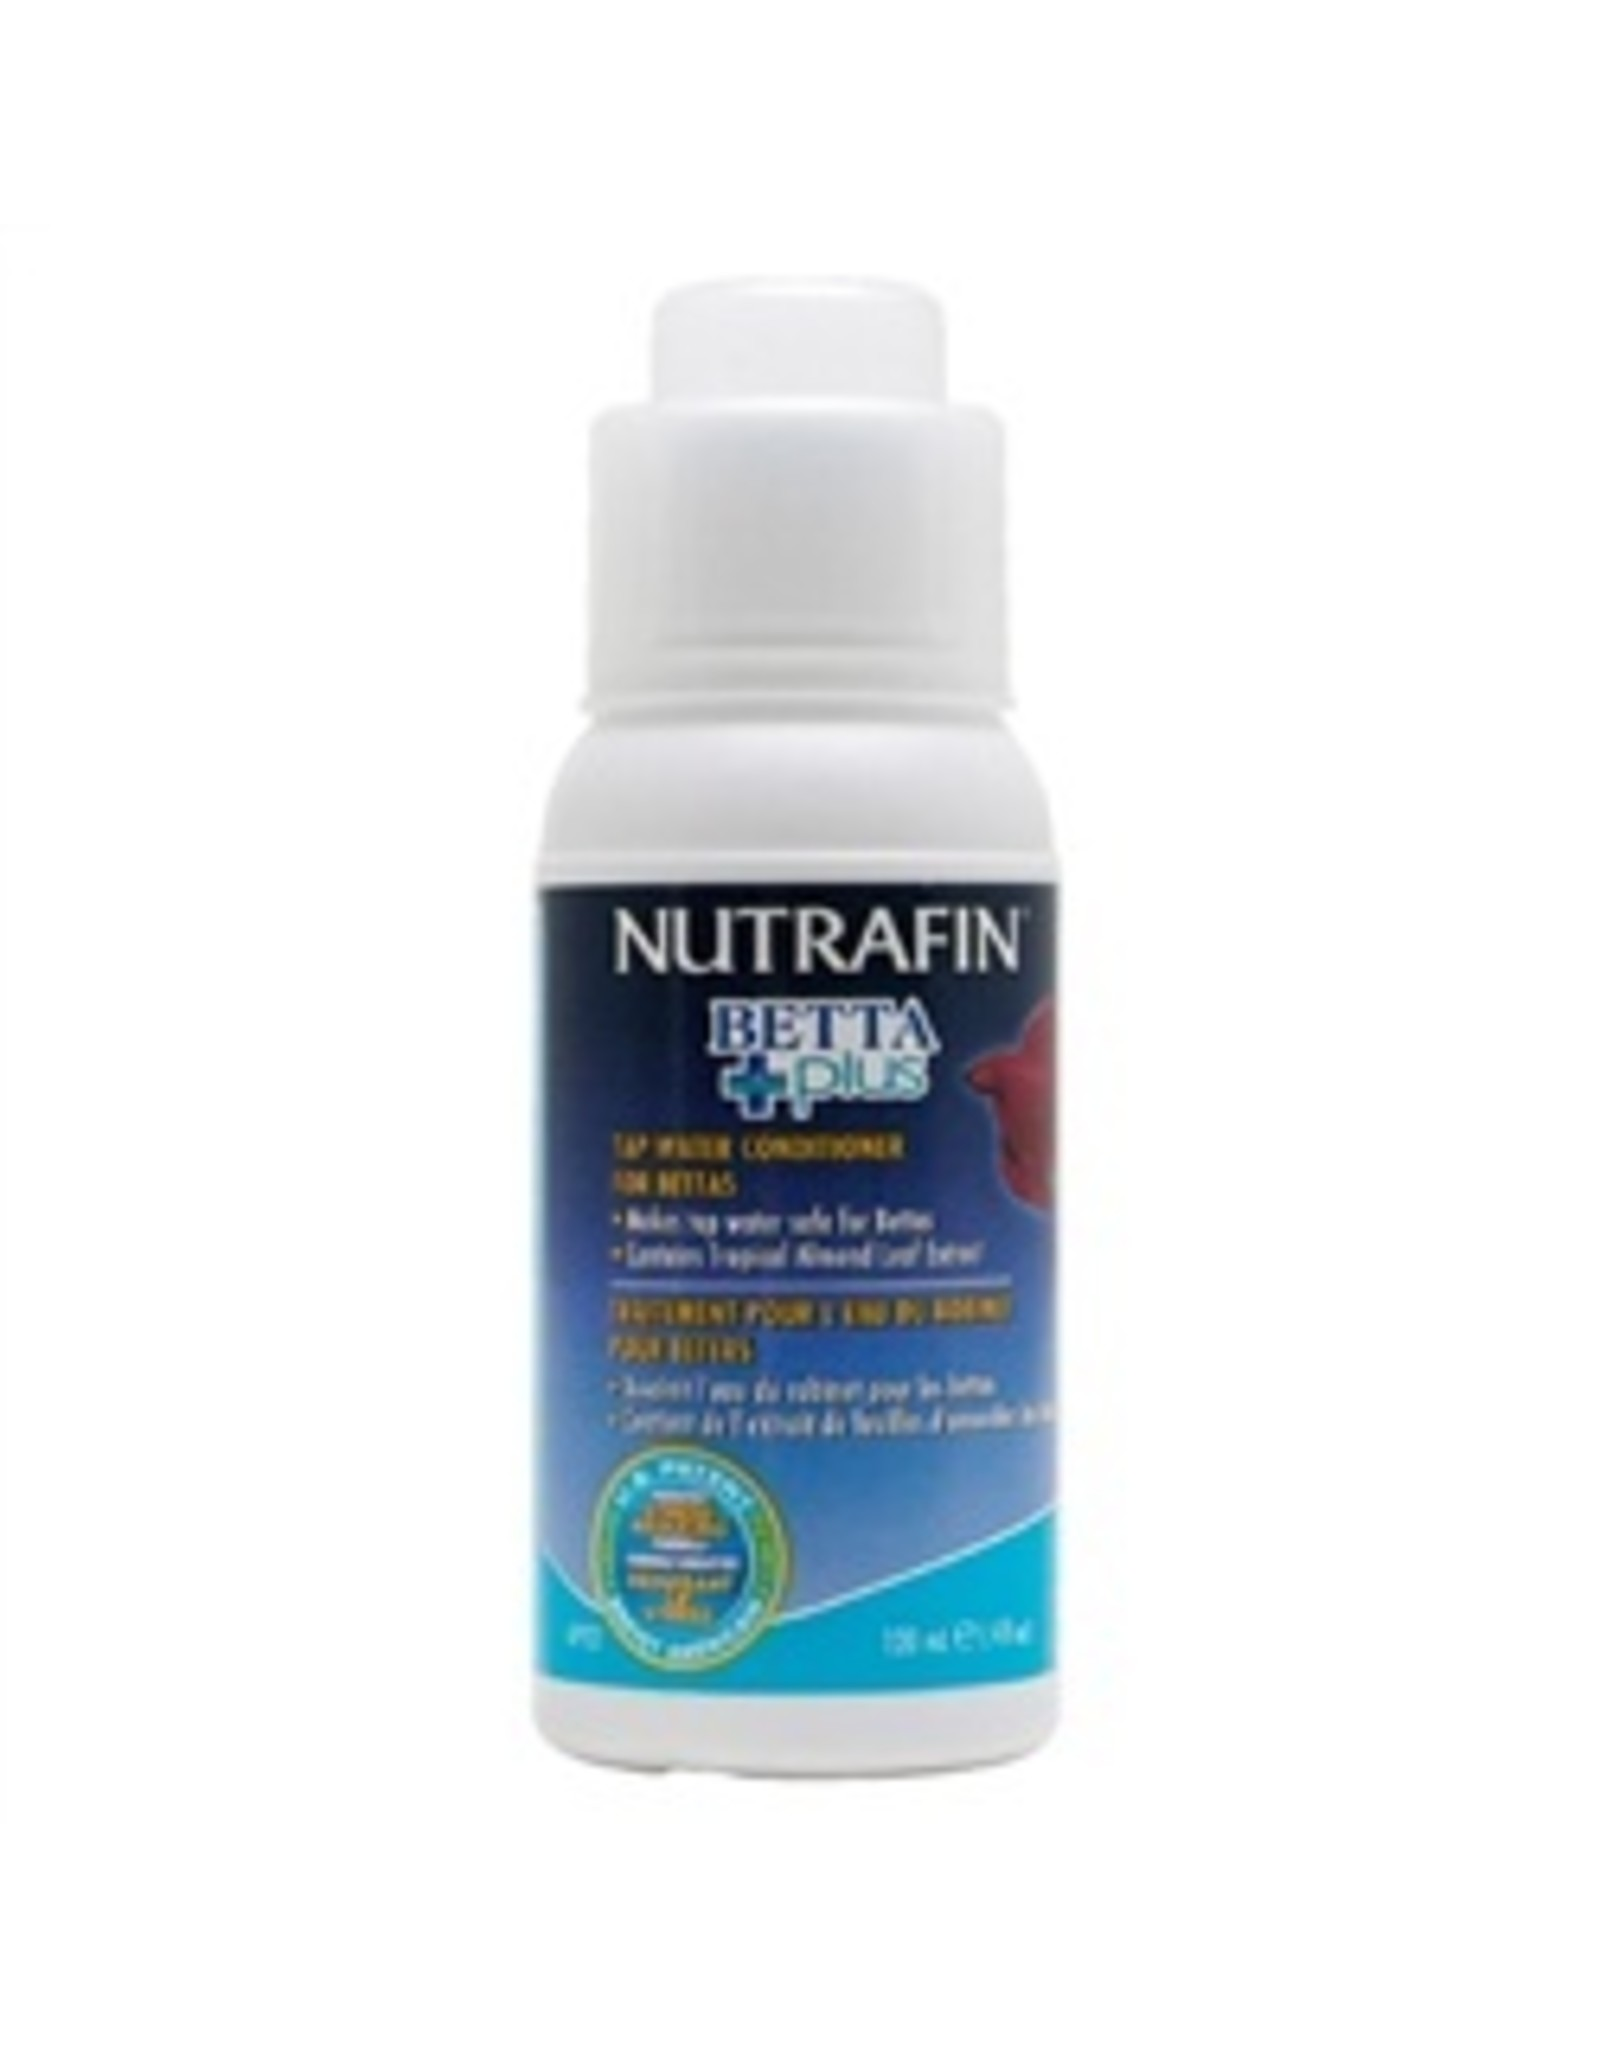 NutraFin NUTRAFIN Betta Plus